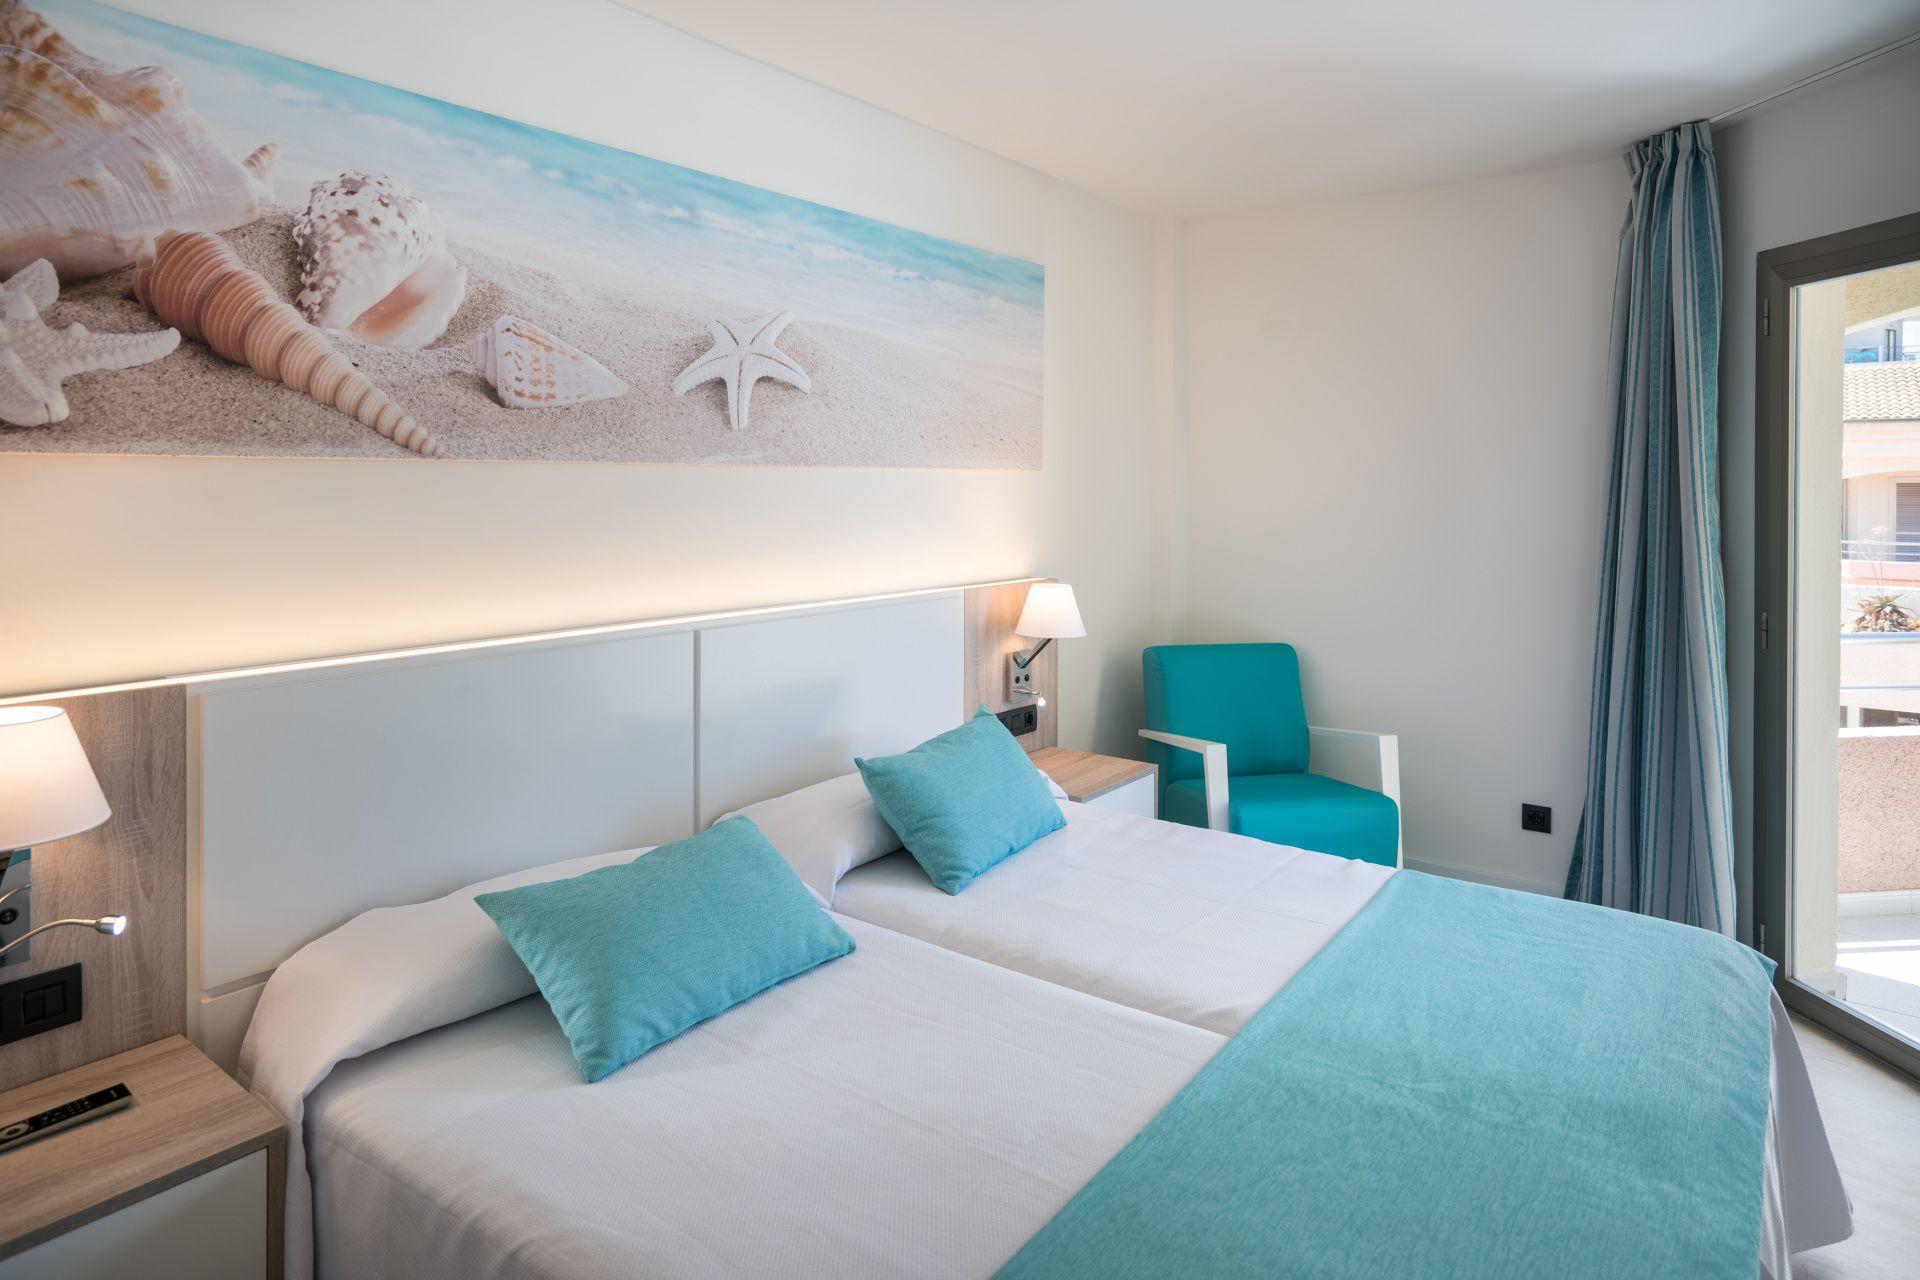 Hotel für Familien, Zimmer mit Meerblick, Cala Ratjada, Mallorca